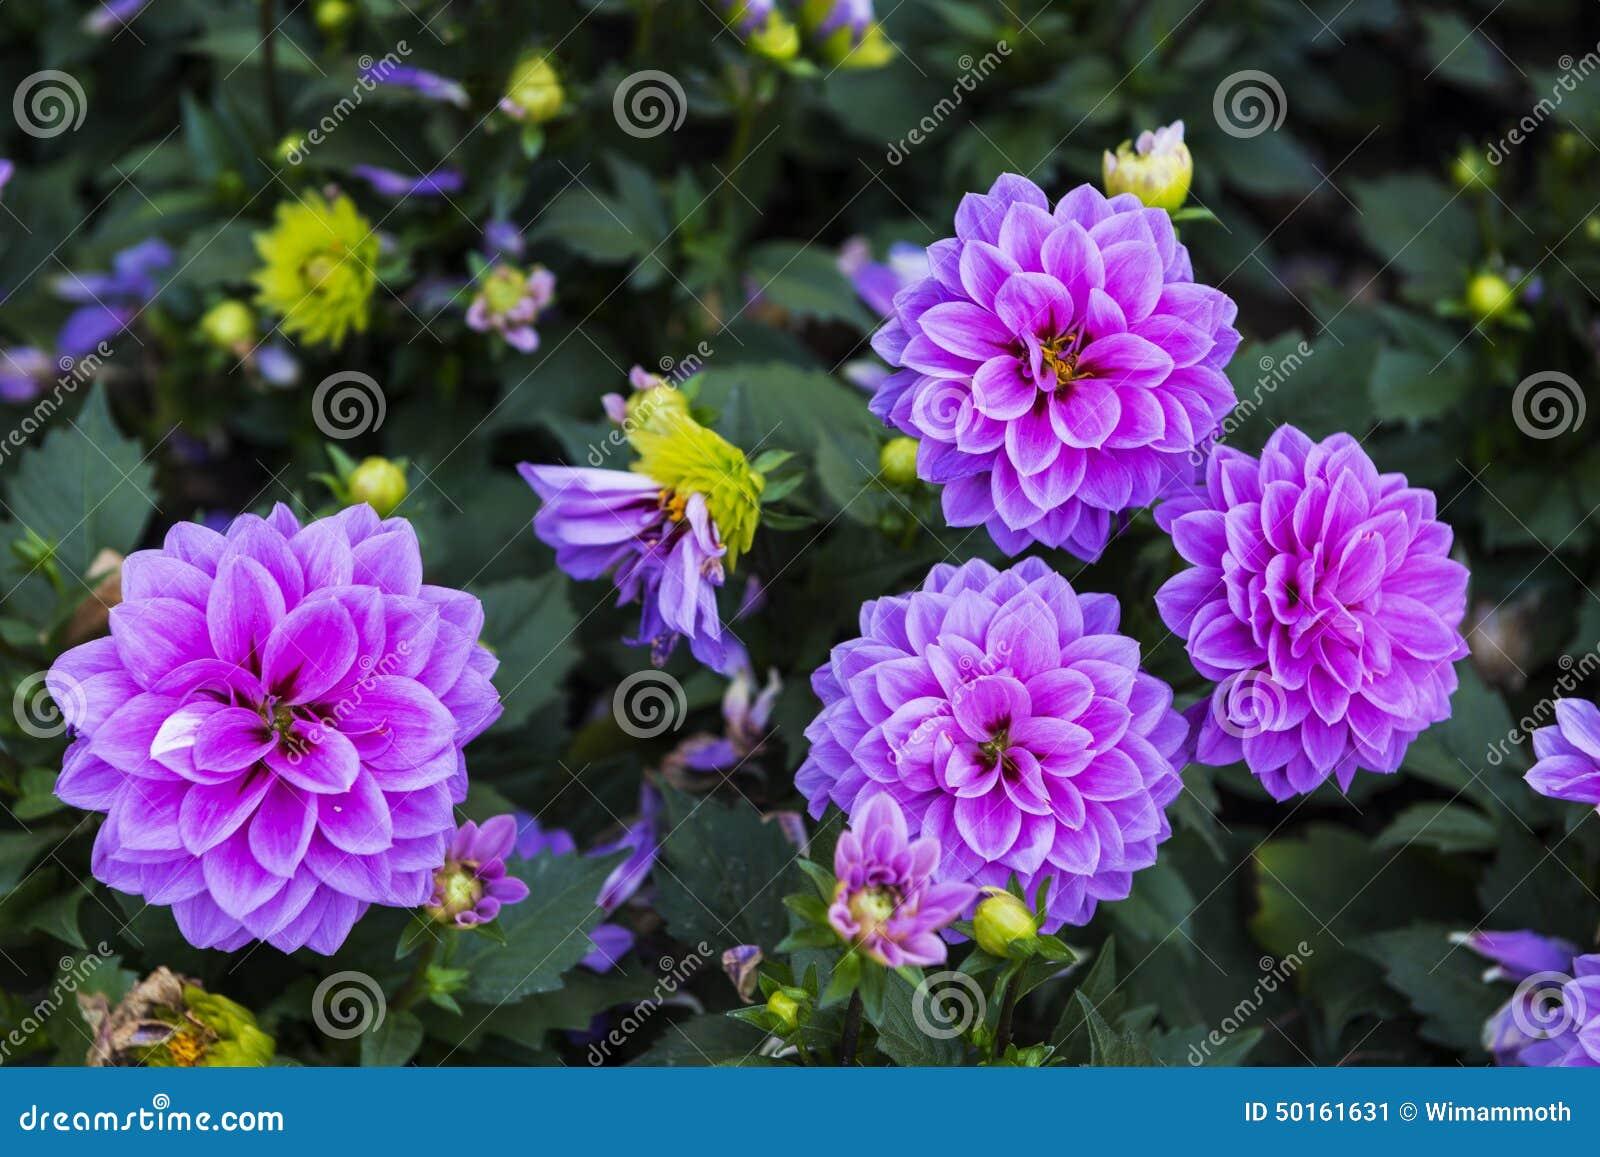 belles fleurs d 39 automne image stock image du outdoors. Black Bedroom Furniture Sets. Home Design Ideas